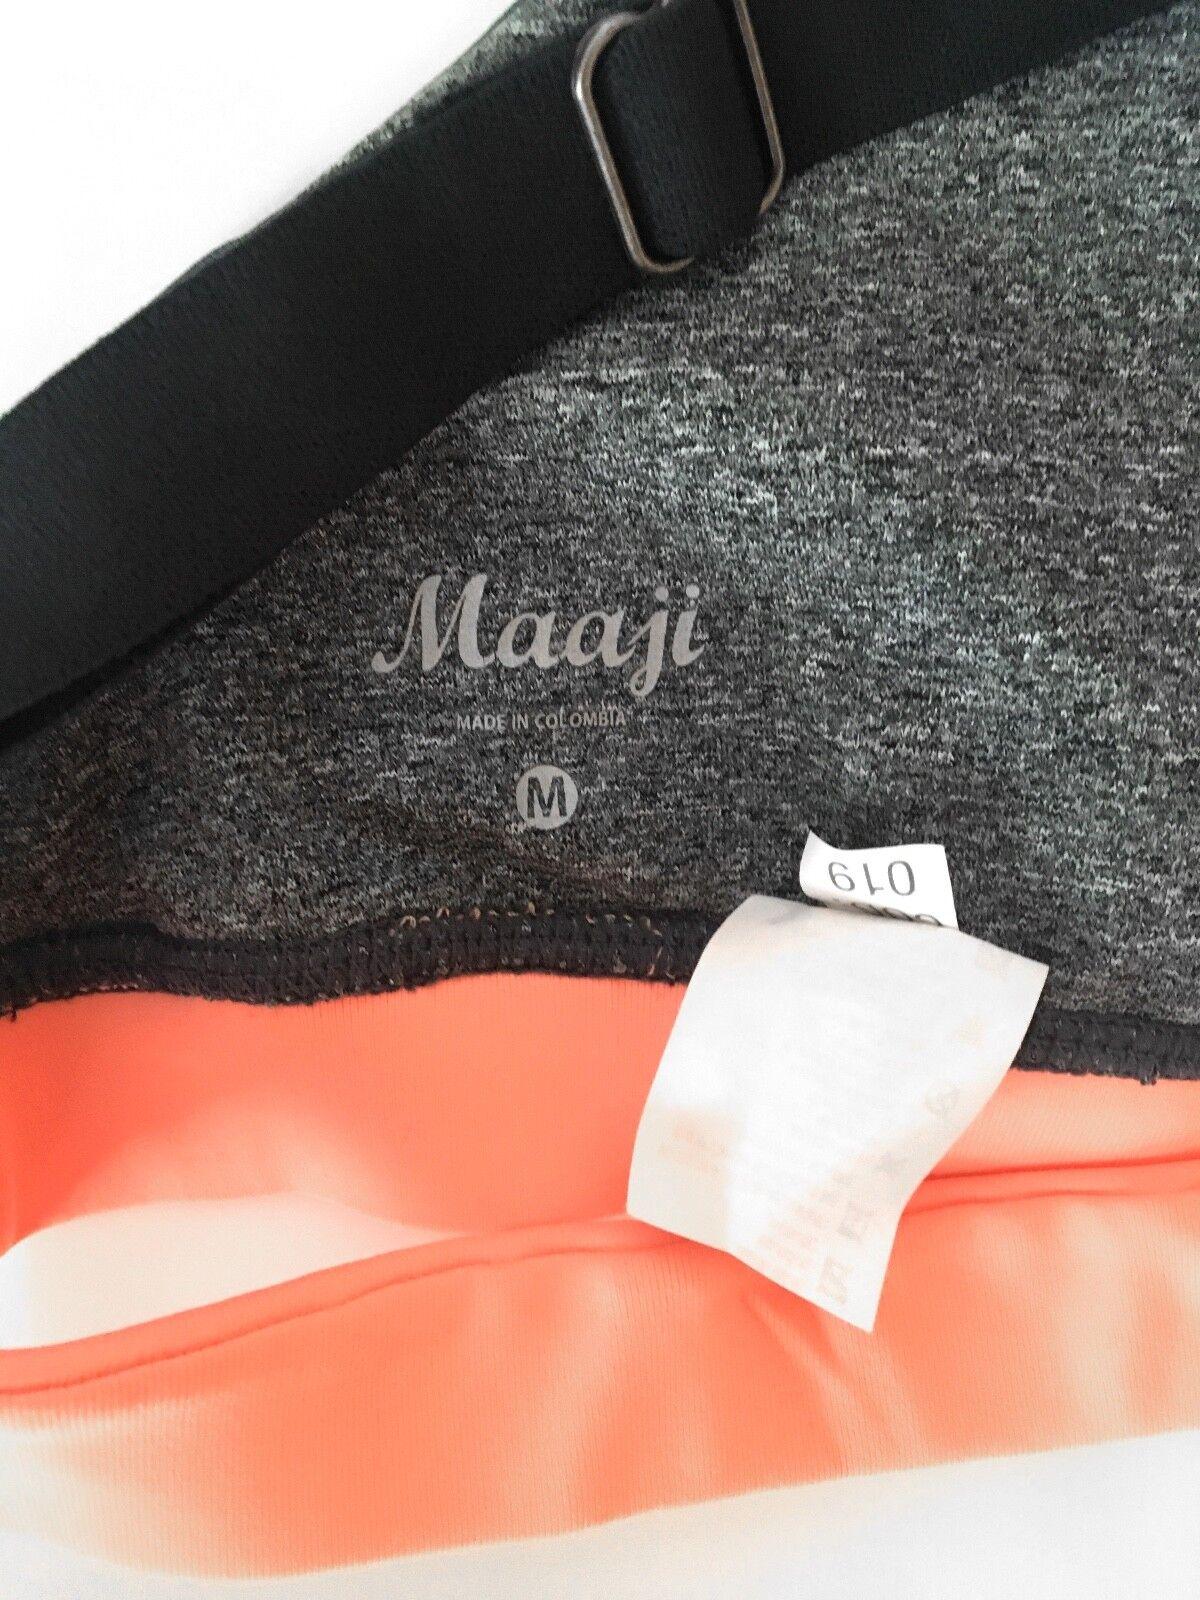 Maaji Donna Sports In Bra Gym Yoga Workout Active In Sports esecuzione Size Medium M c106c7